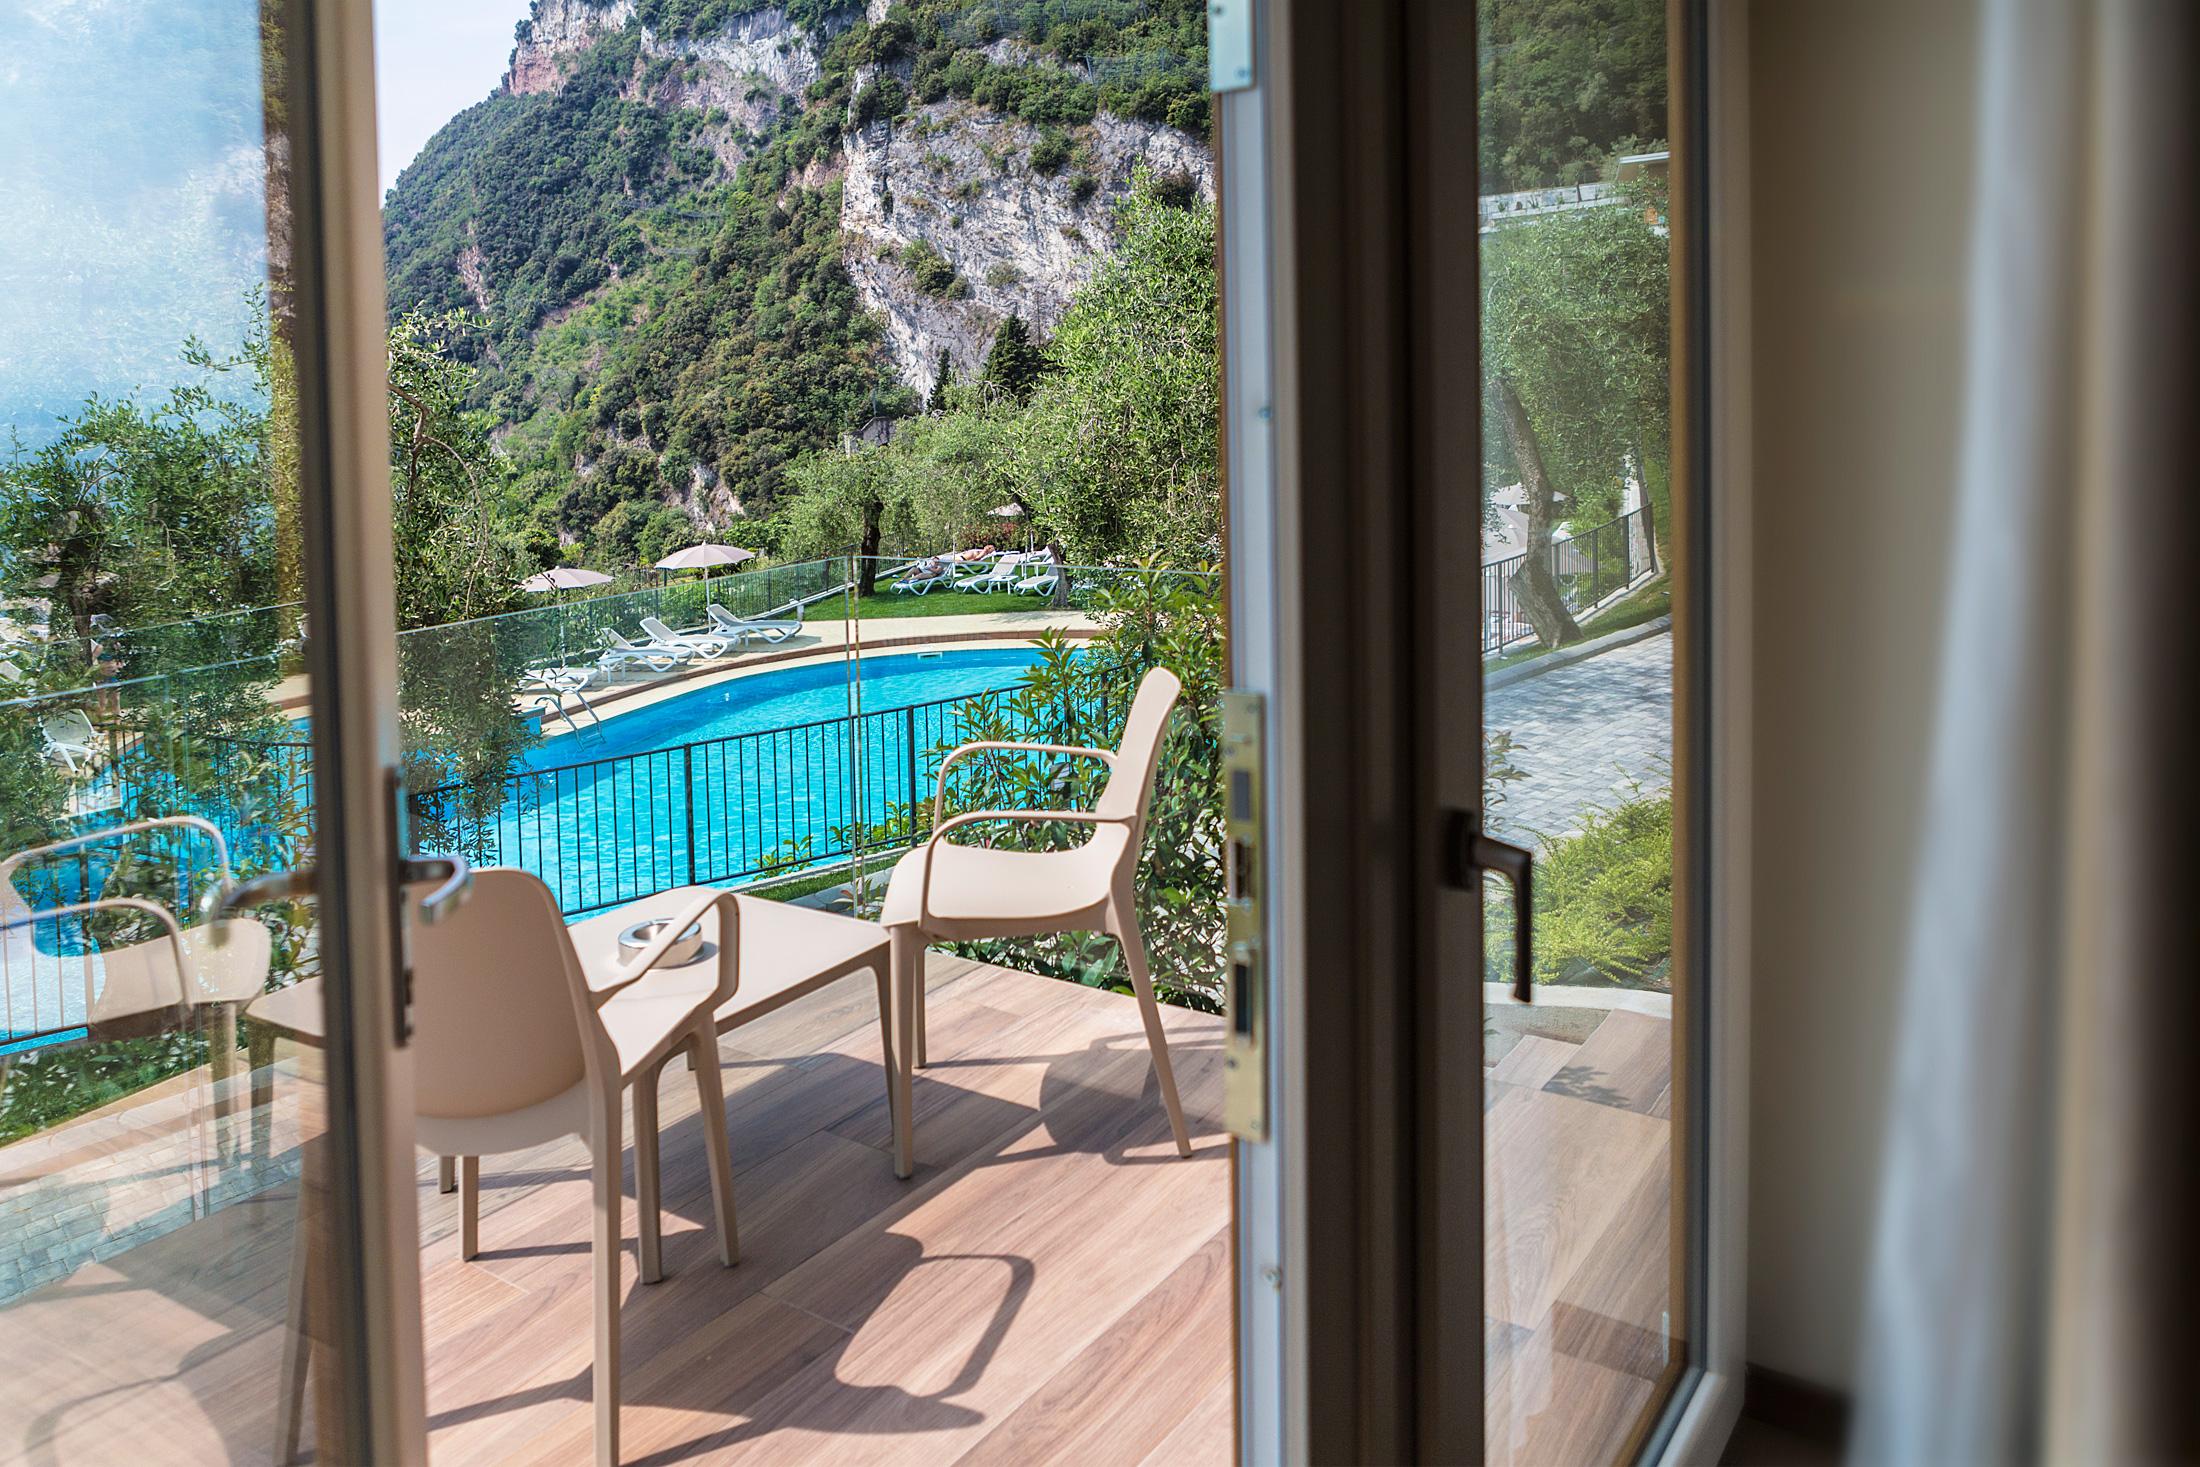 hotel_atilius_camera_vista_lago_con_balcone001.jpg